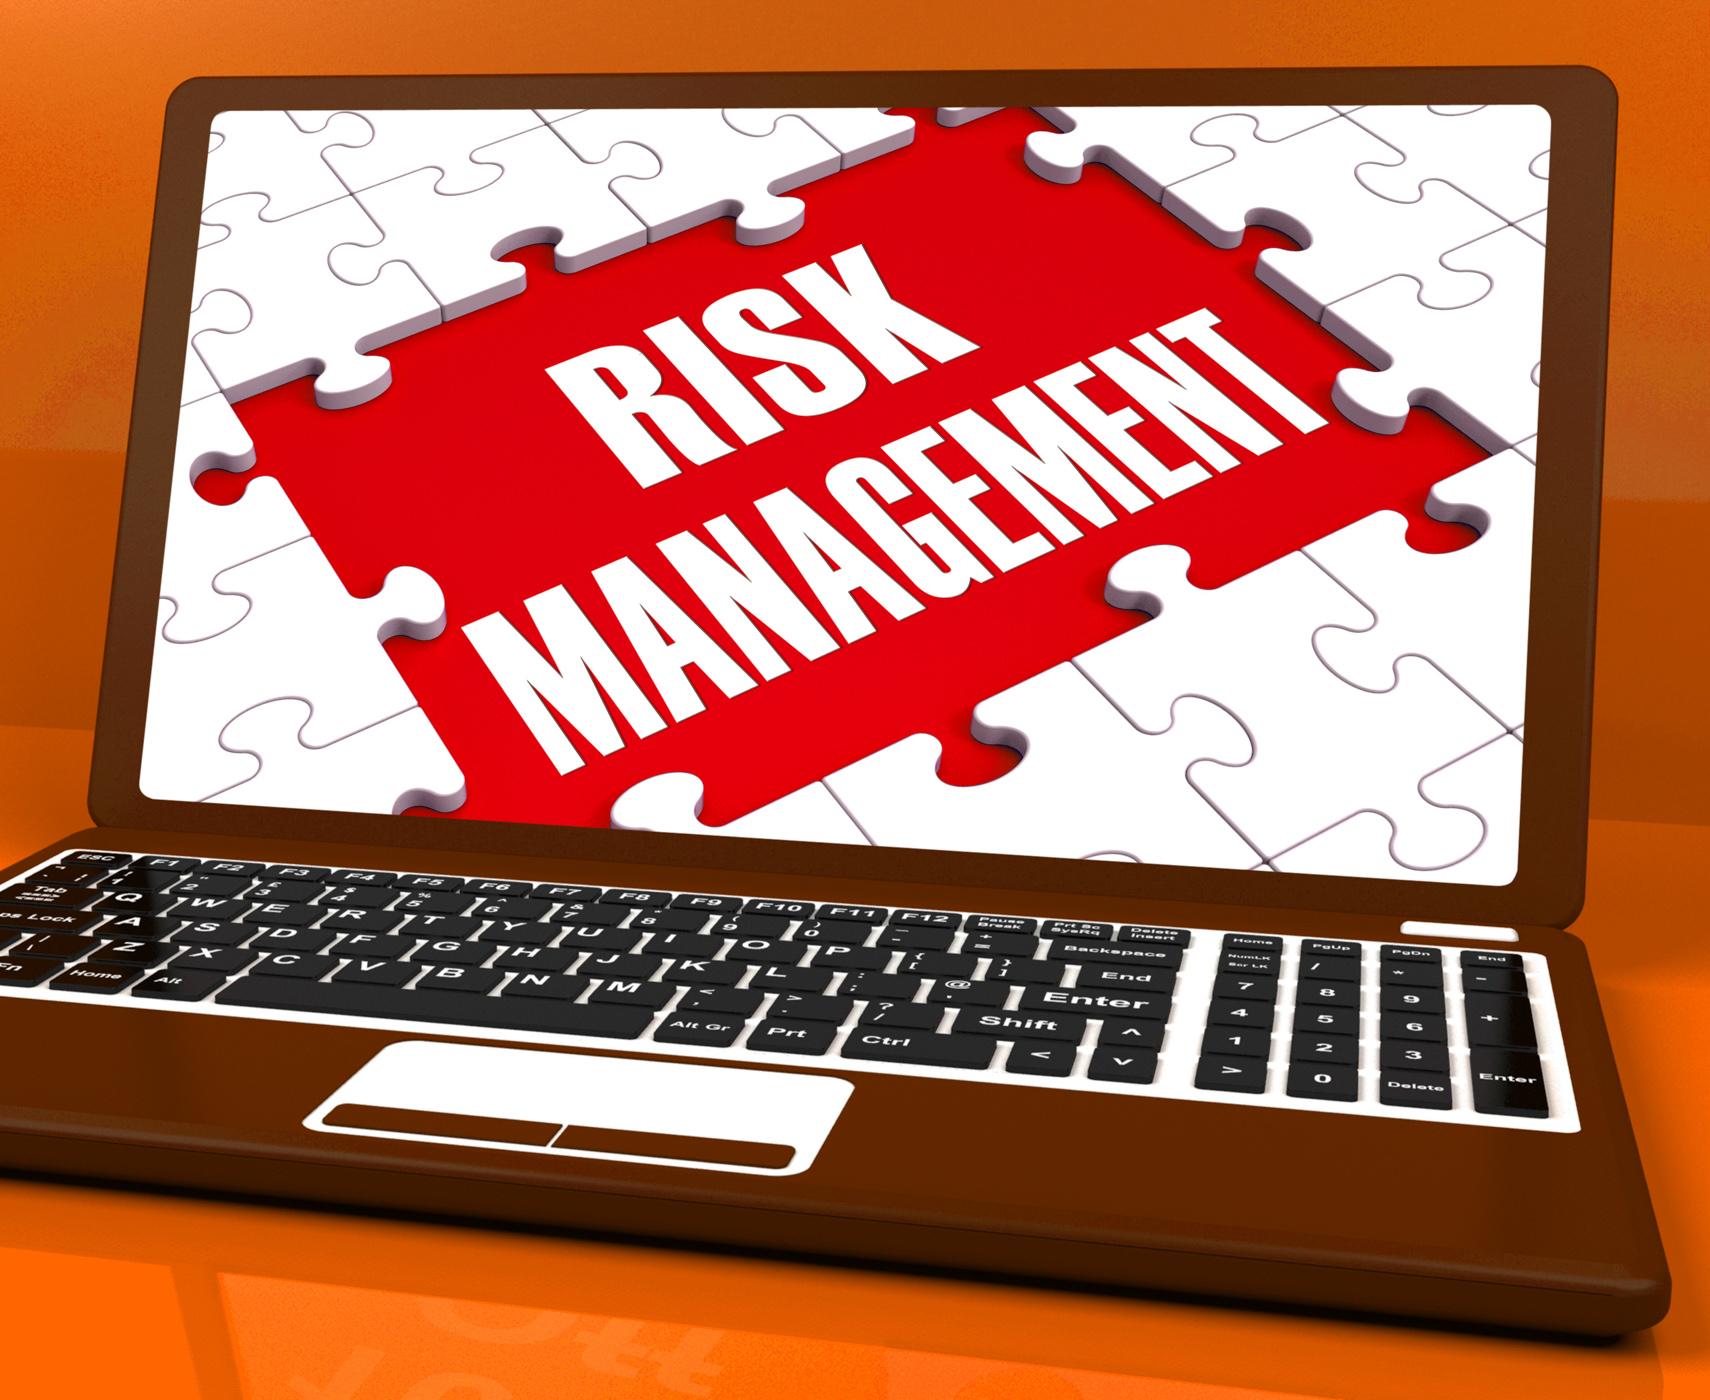 Risk Management On Laptop Showing Risky Analysis, Advice, Management, Vulnerable, Vulnerability, HQ Photo